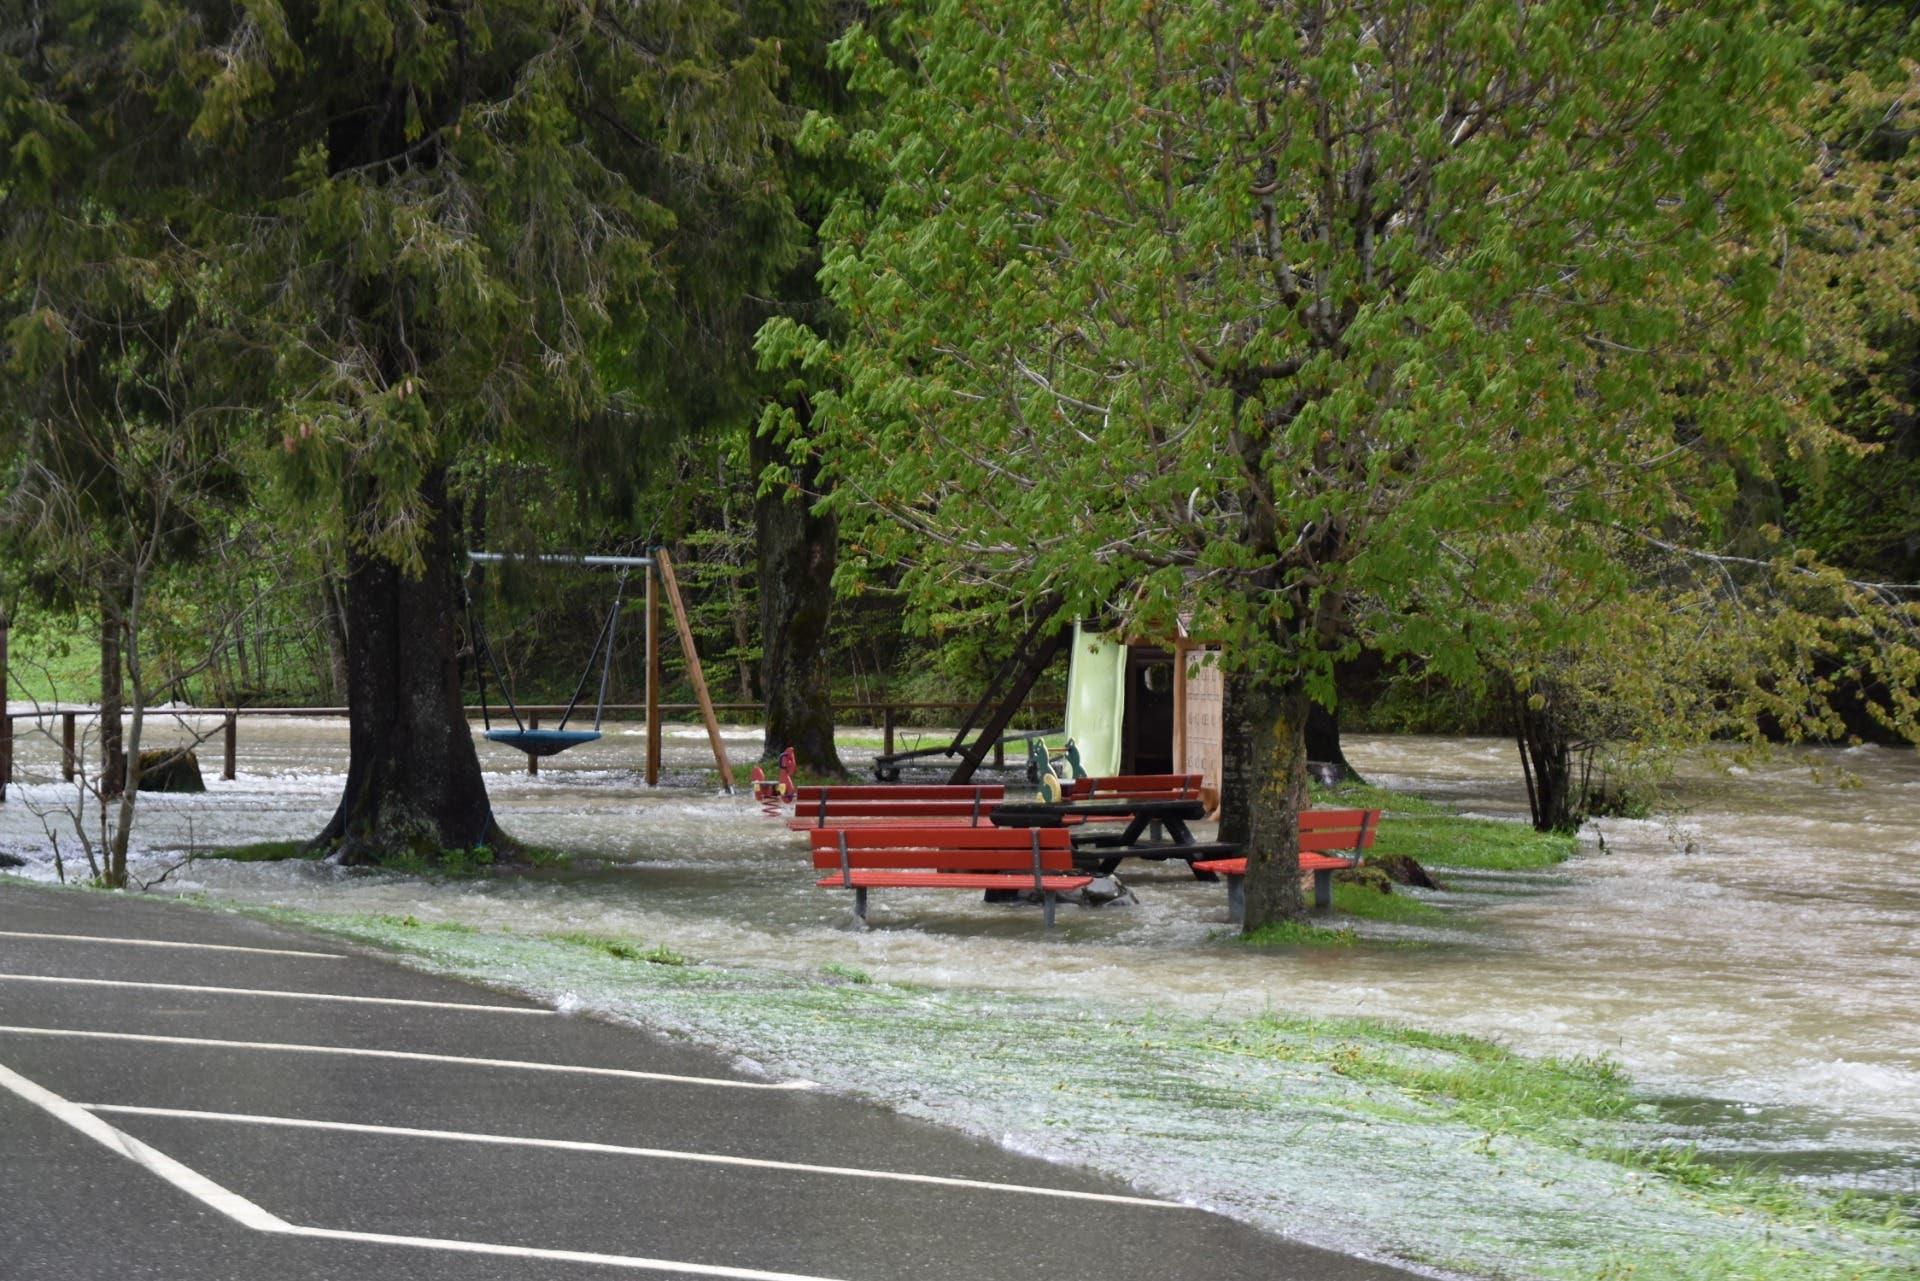 Überfluteter Spielplatz in Alt St.Johann. (Bild: Timon Kobelt)